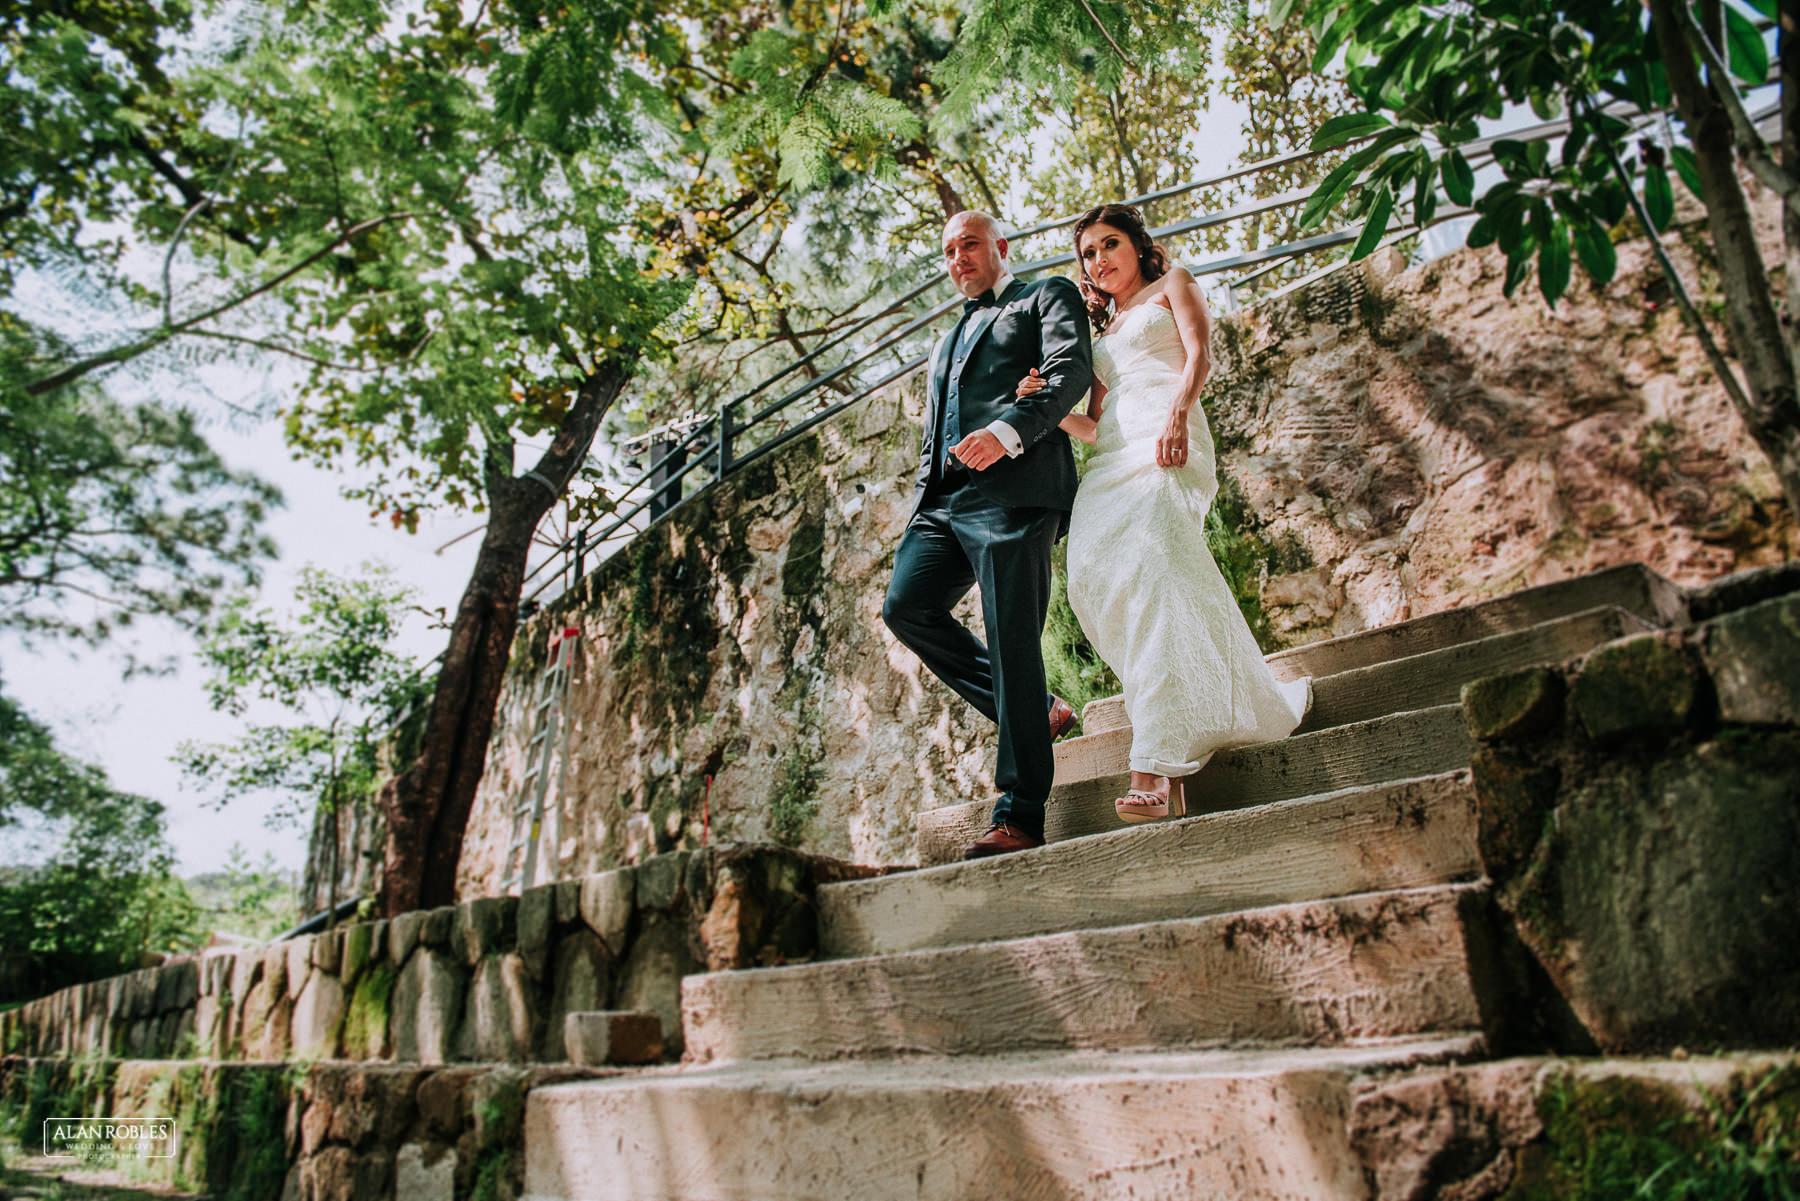 Fotografo de bodas guadalajara Alan Robles - Pinare terraza bistro 9